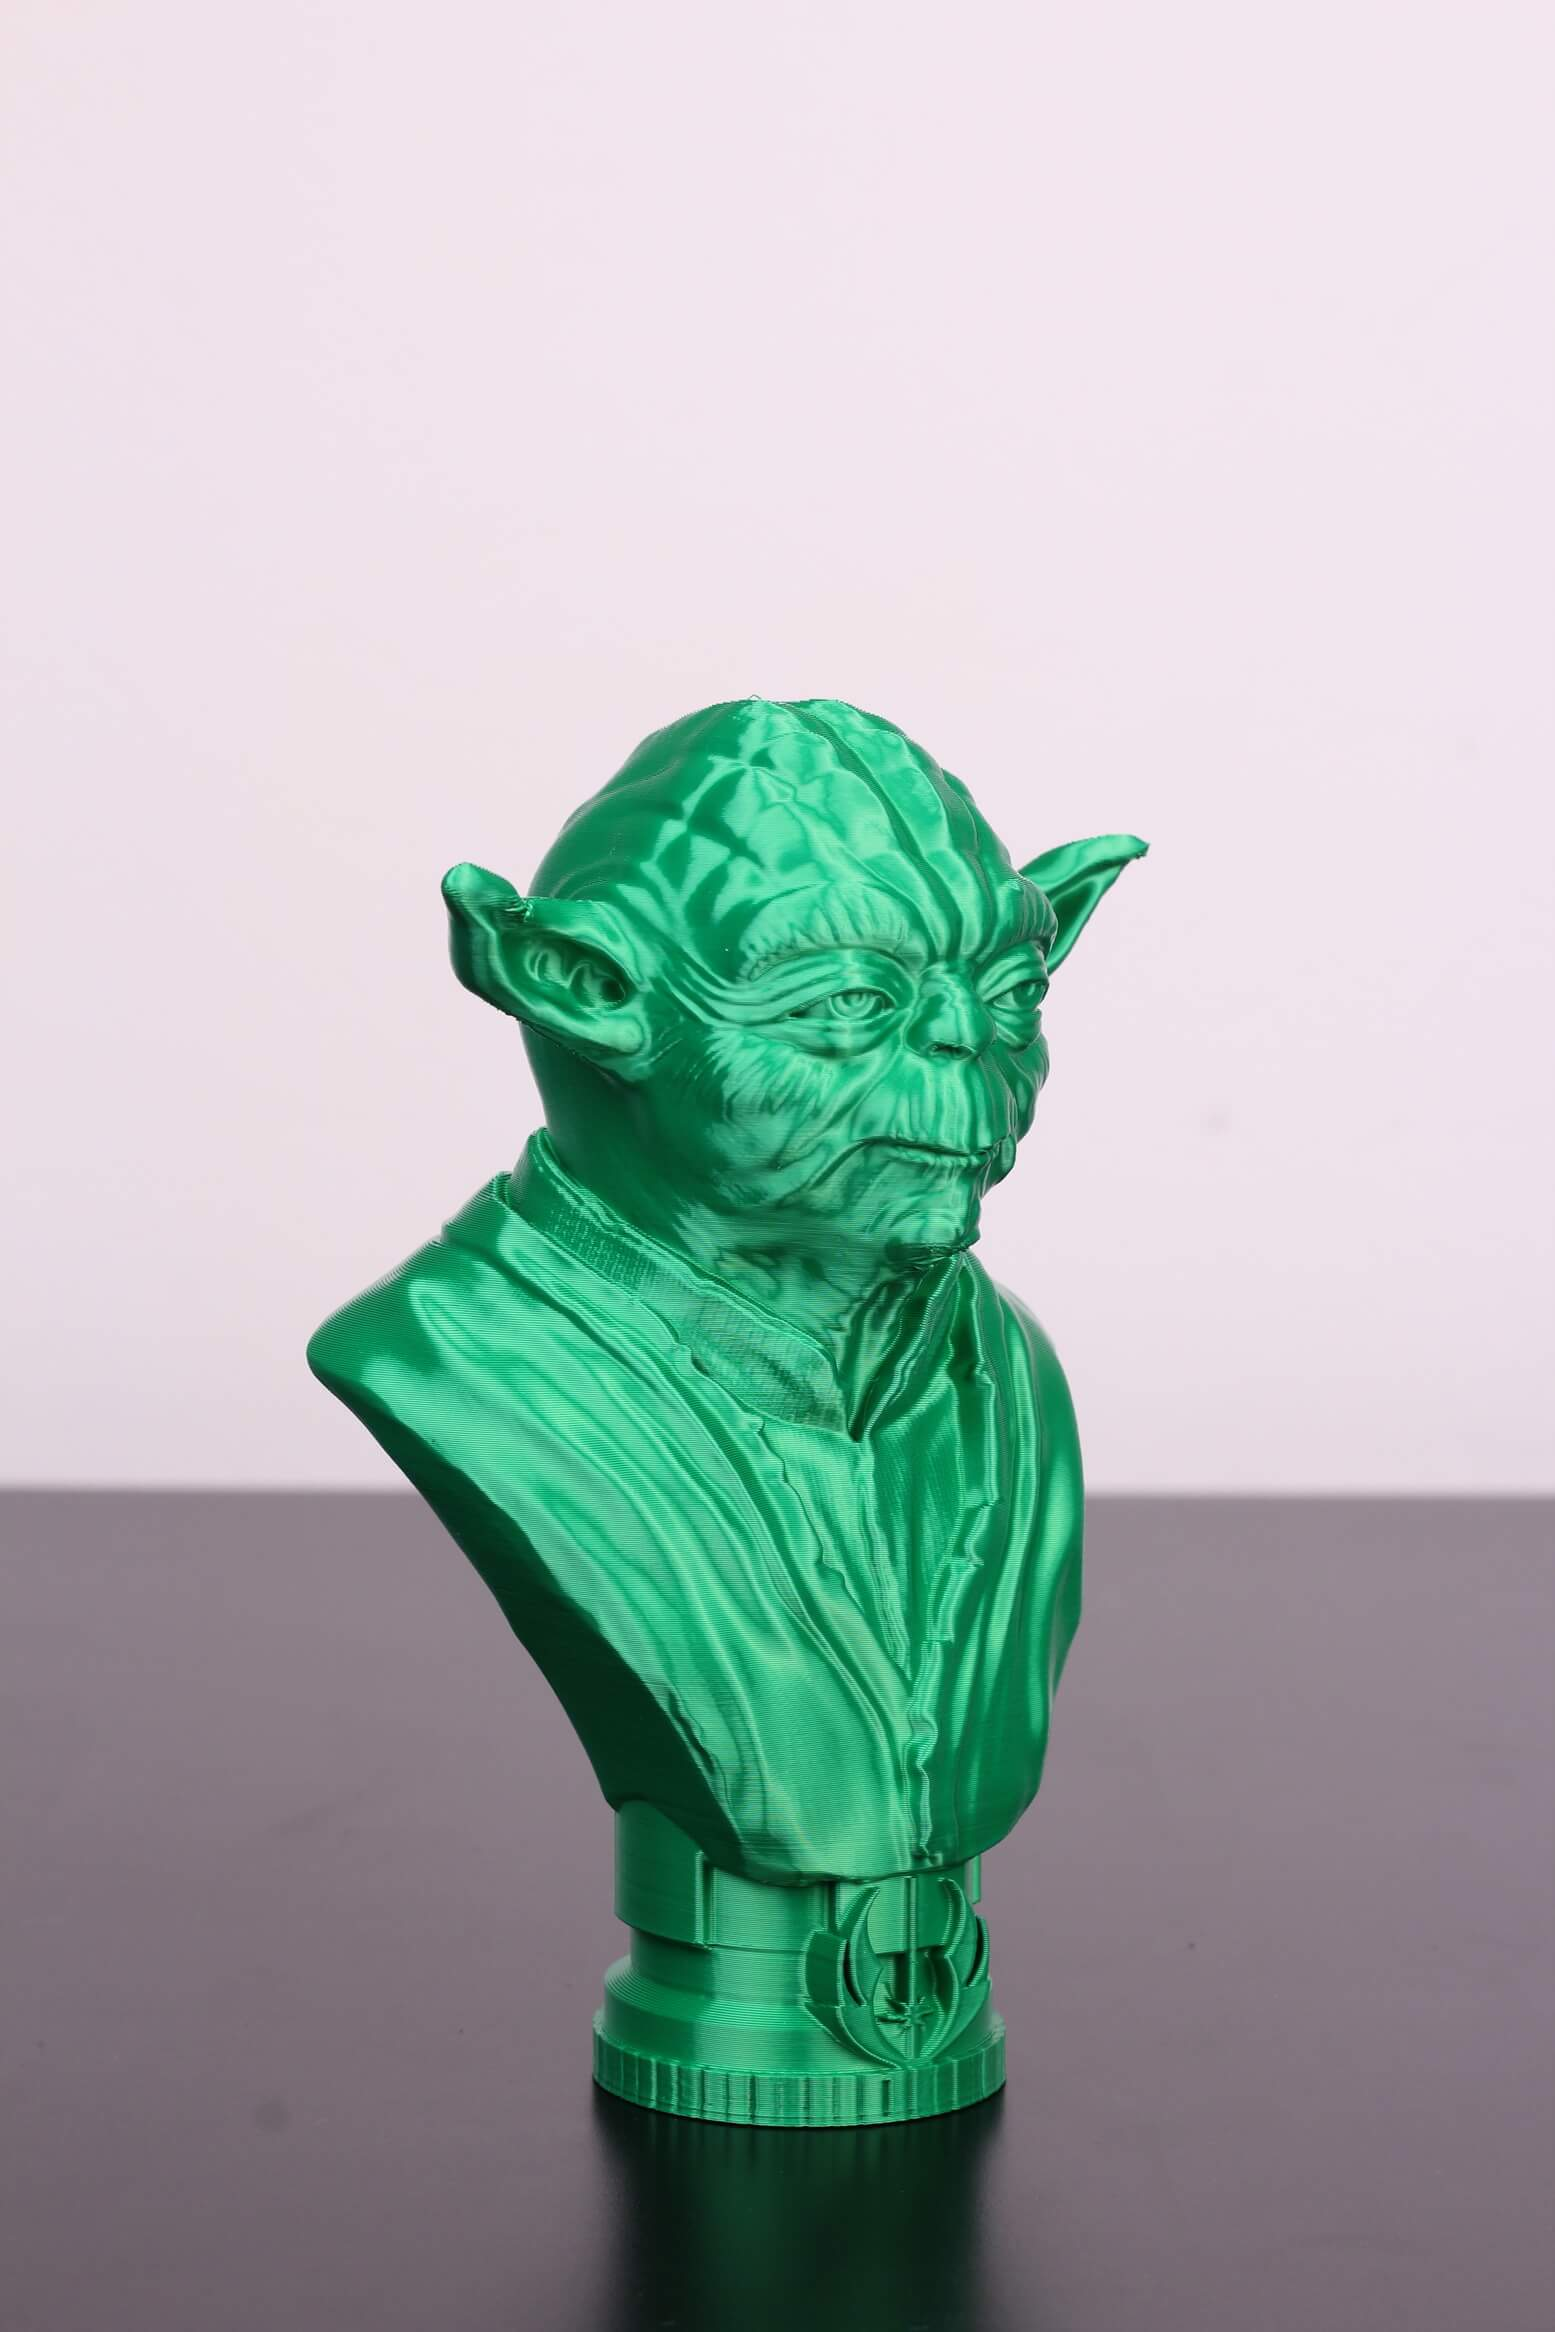 Yoda-Bust-on-Kingroon-KP3S-4